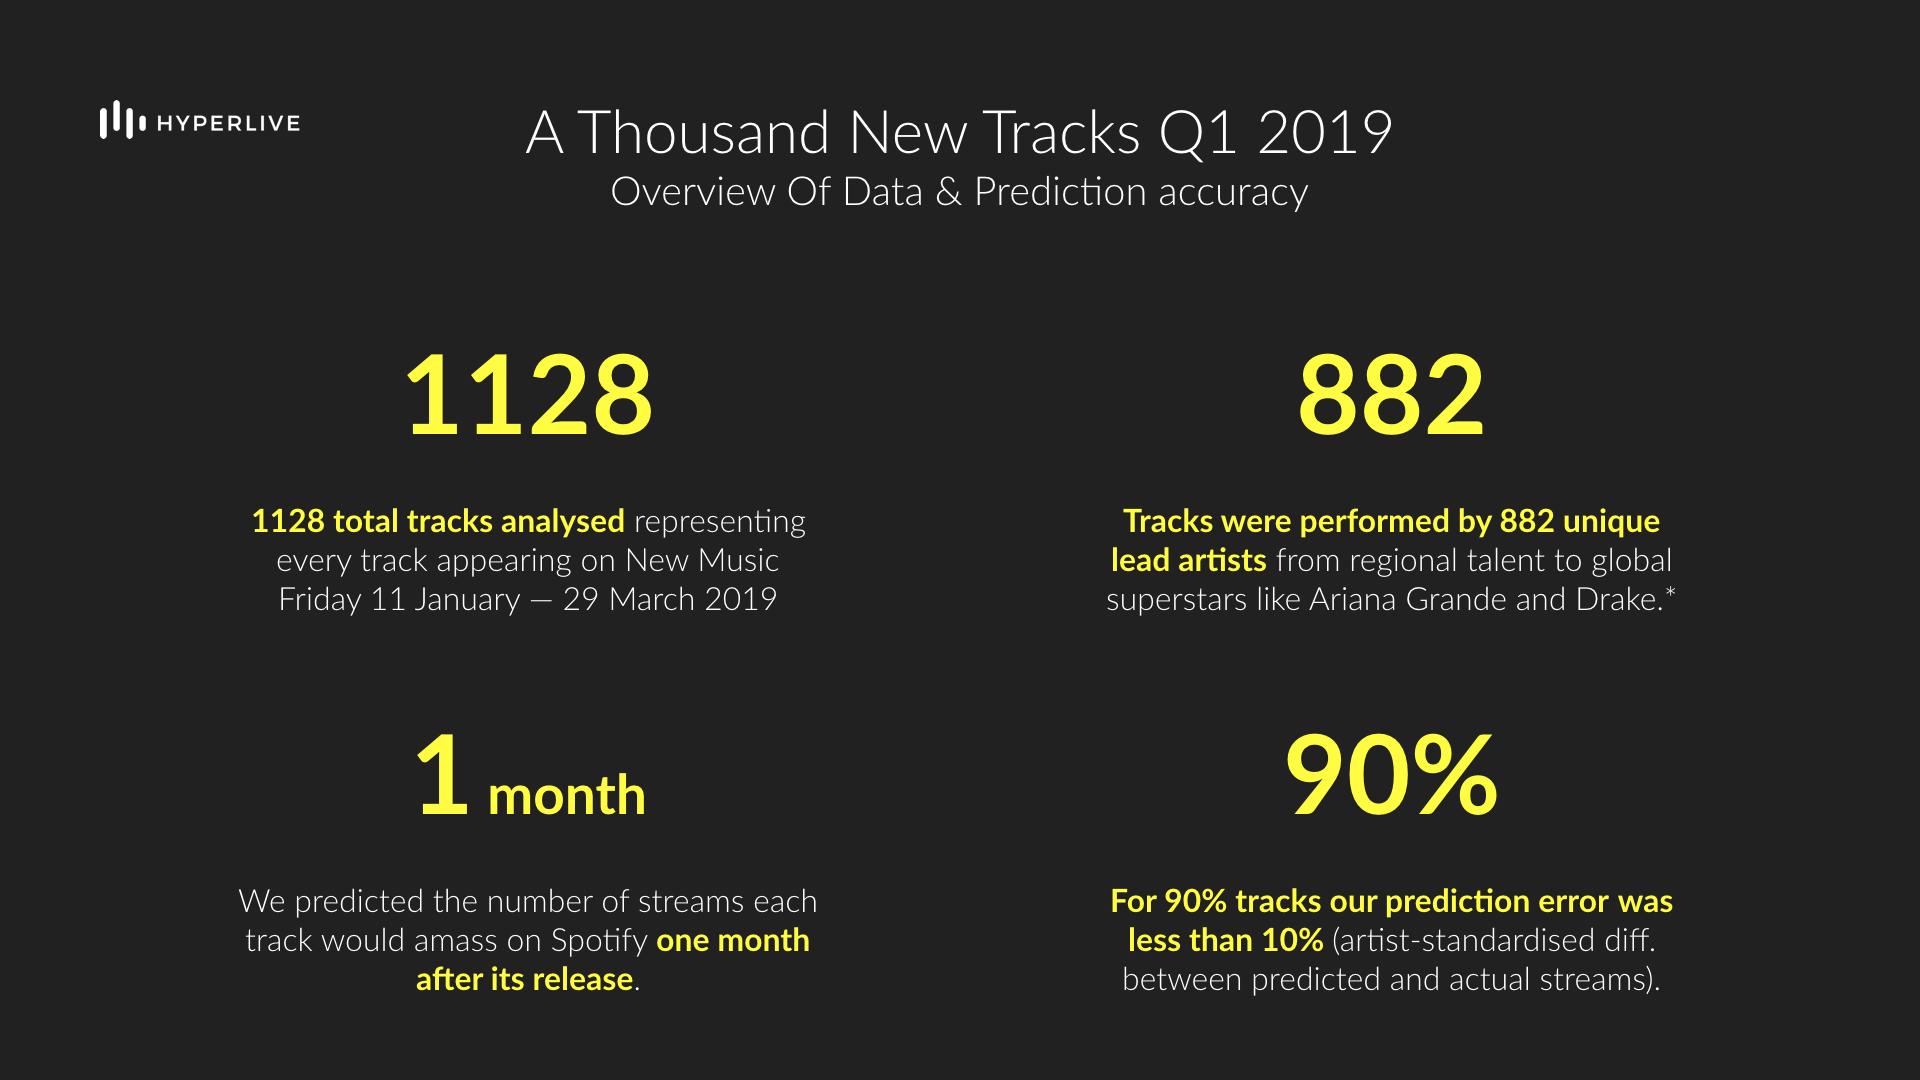 Hyperlive A Thousand New Tracks Q1 2019.jpeg